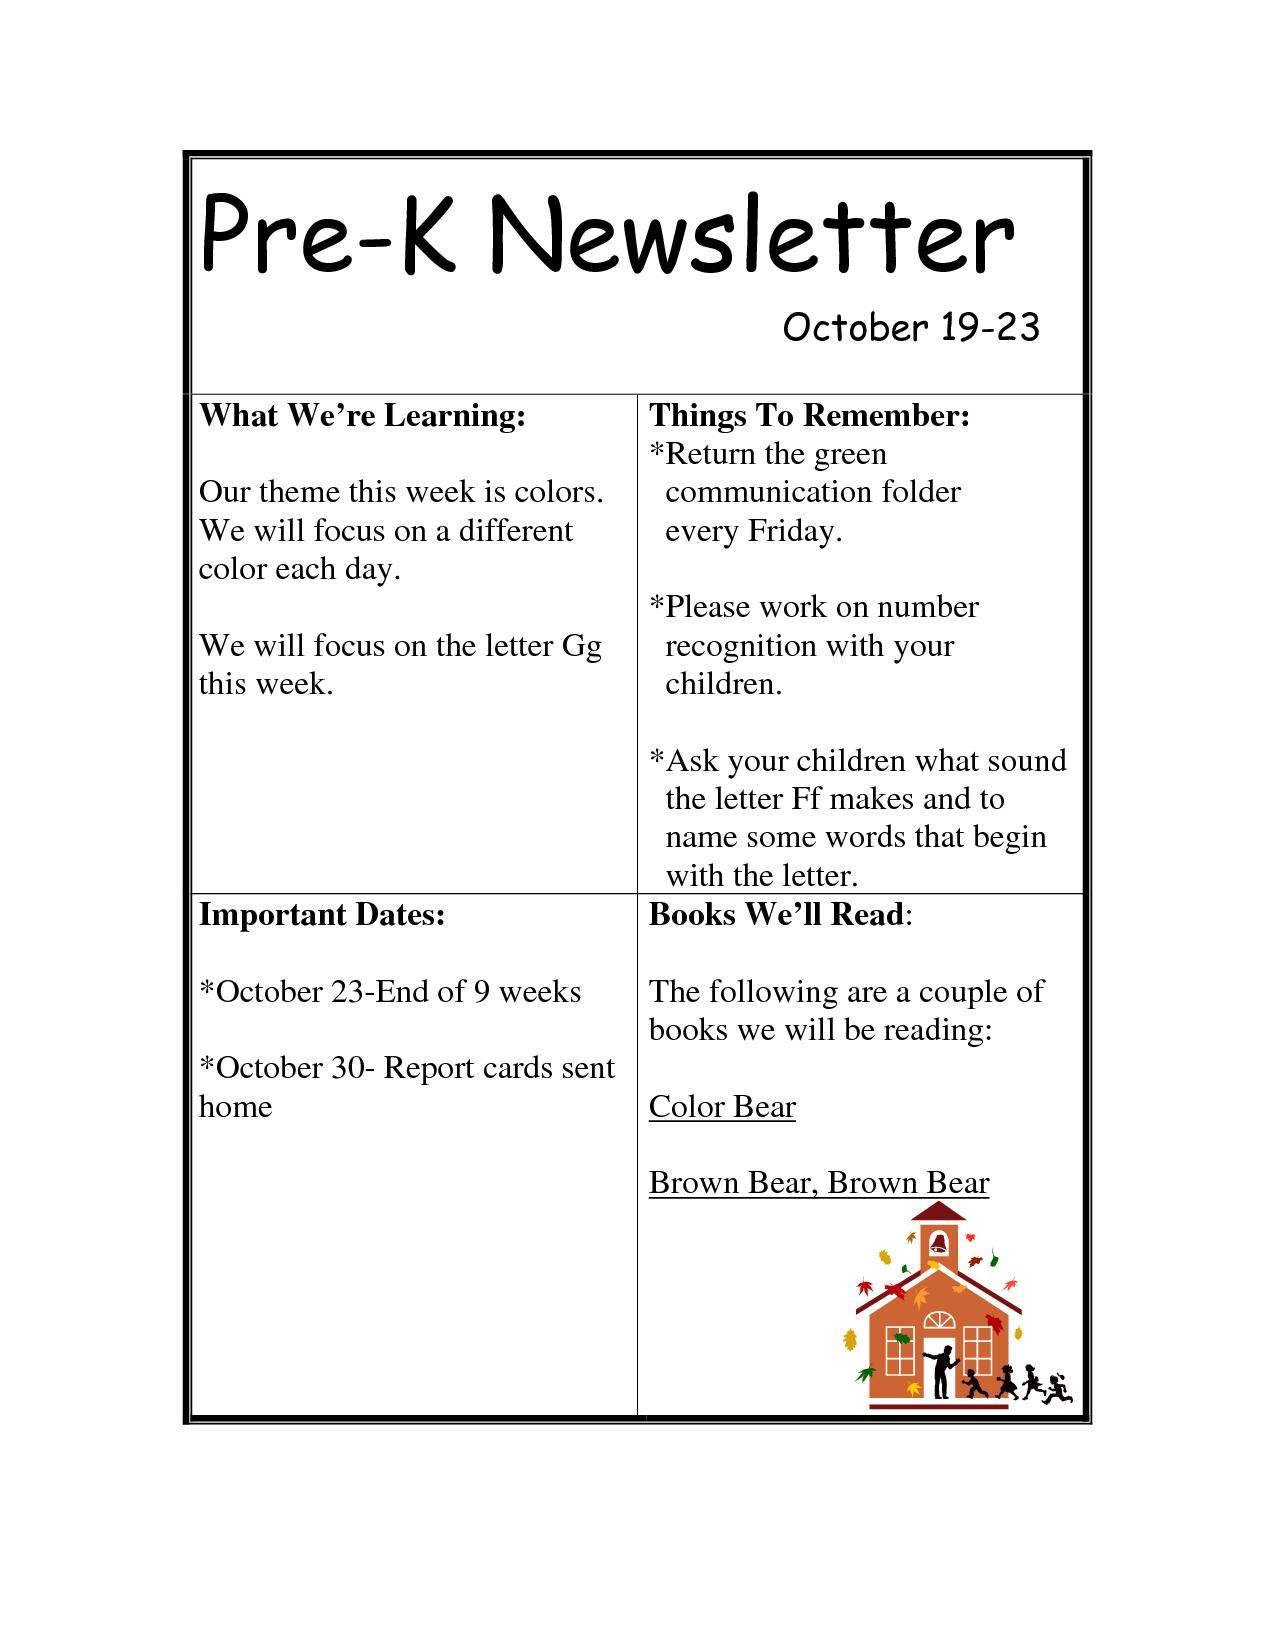 Pre k newsletter templates pre k newsletter teacher parent pre k newsletter templates pre k newsletter spiritdancerdesigns Choice Image